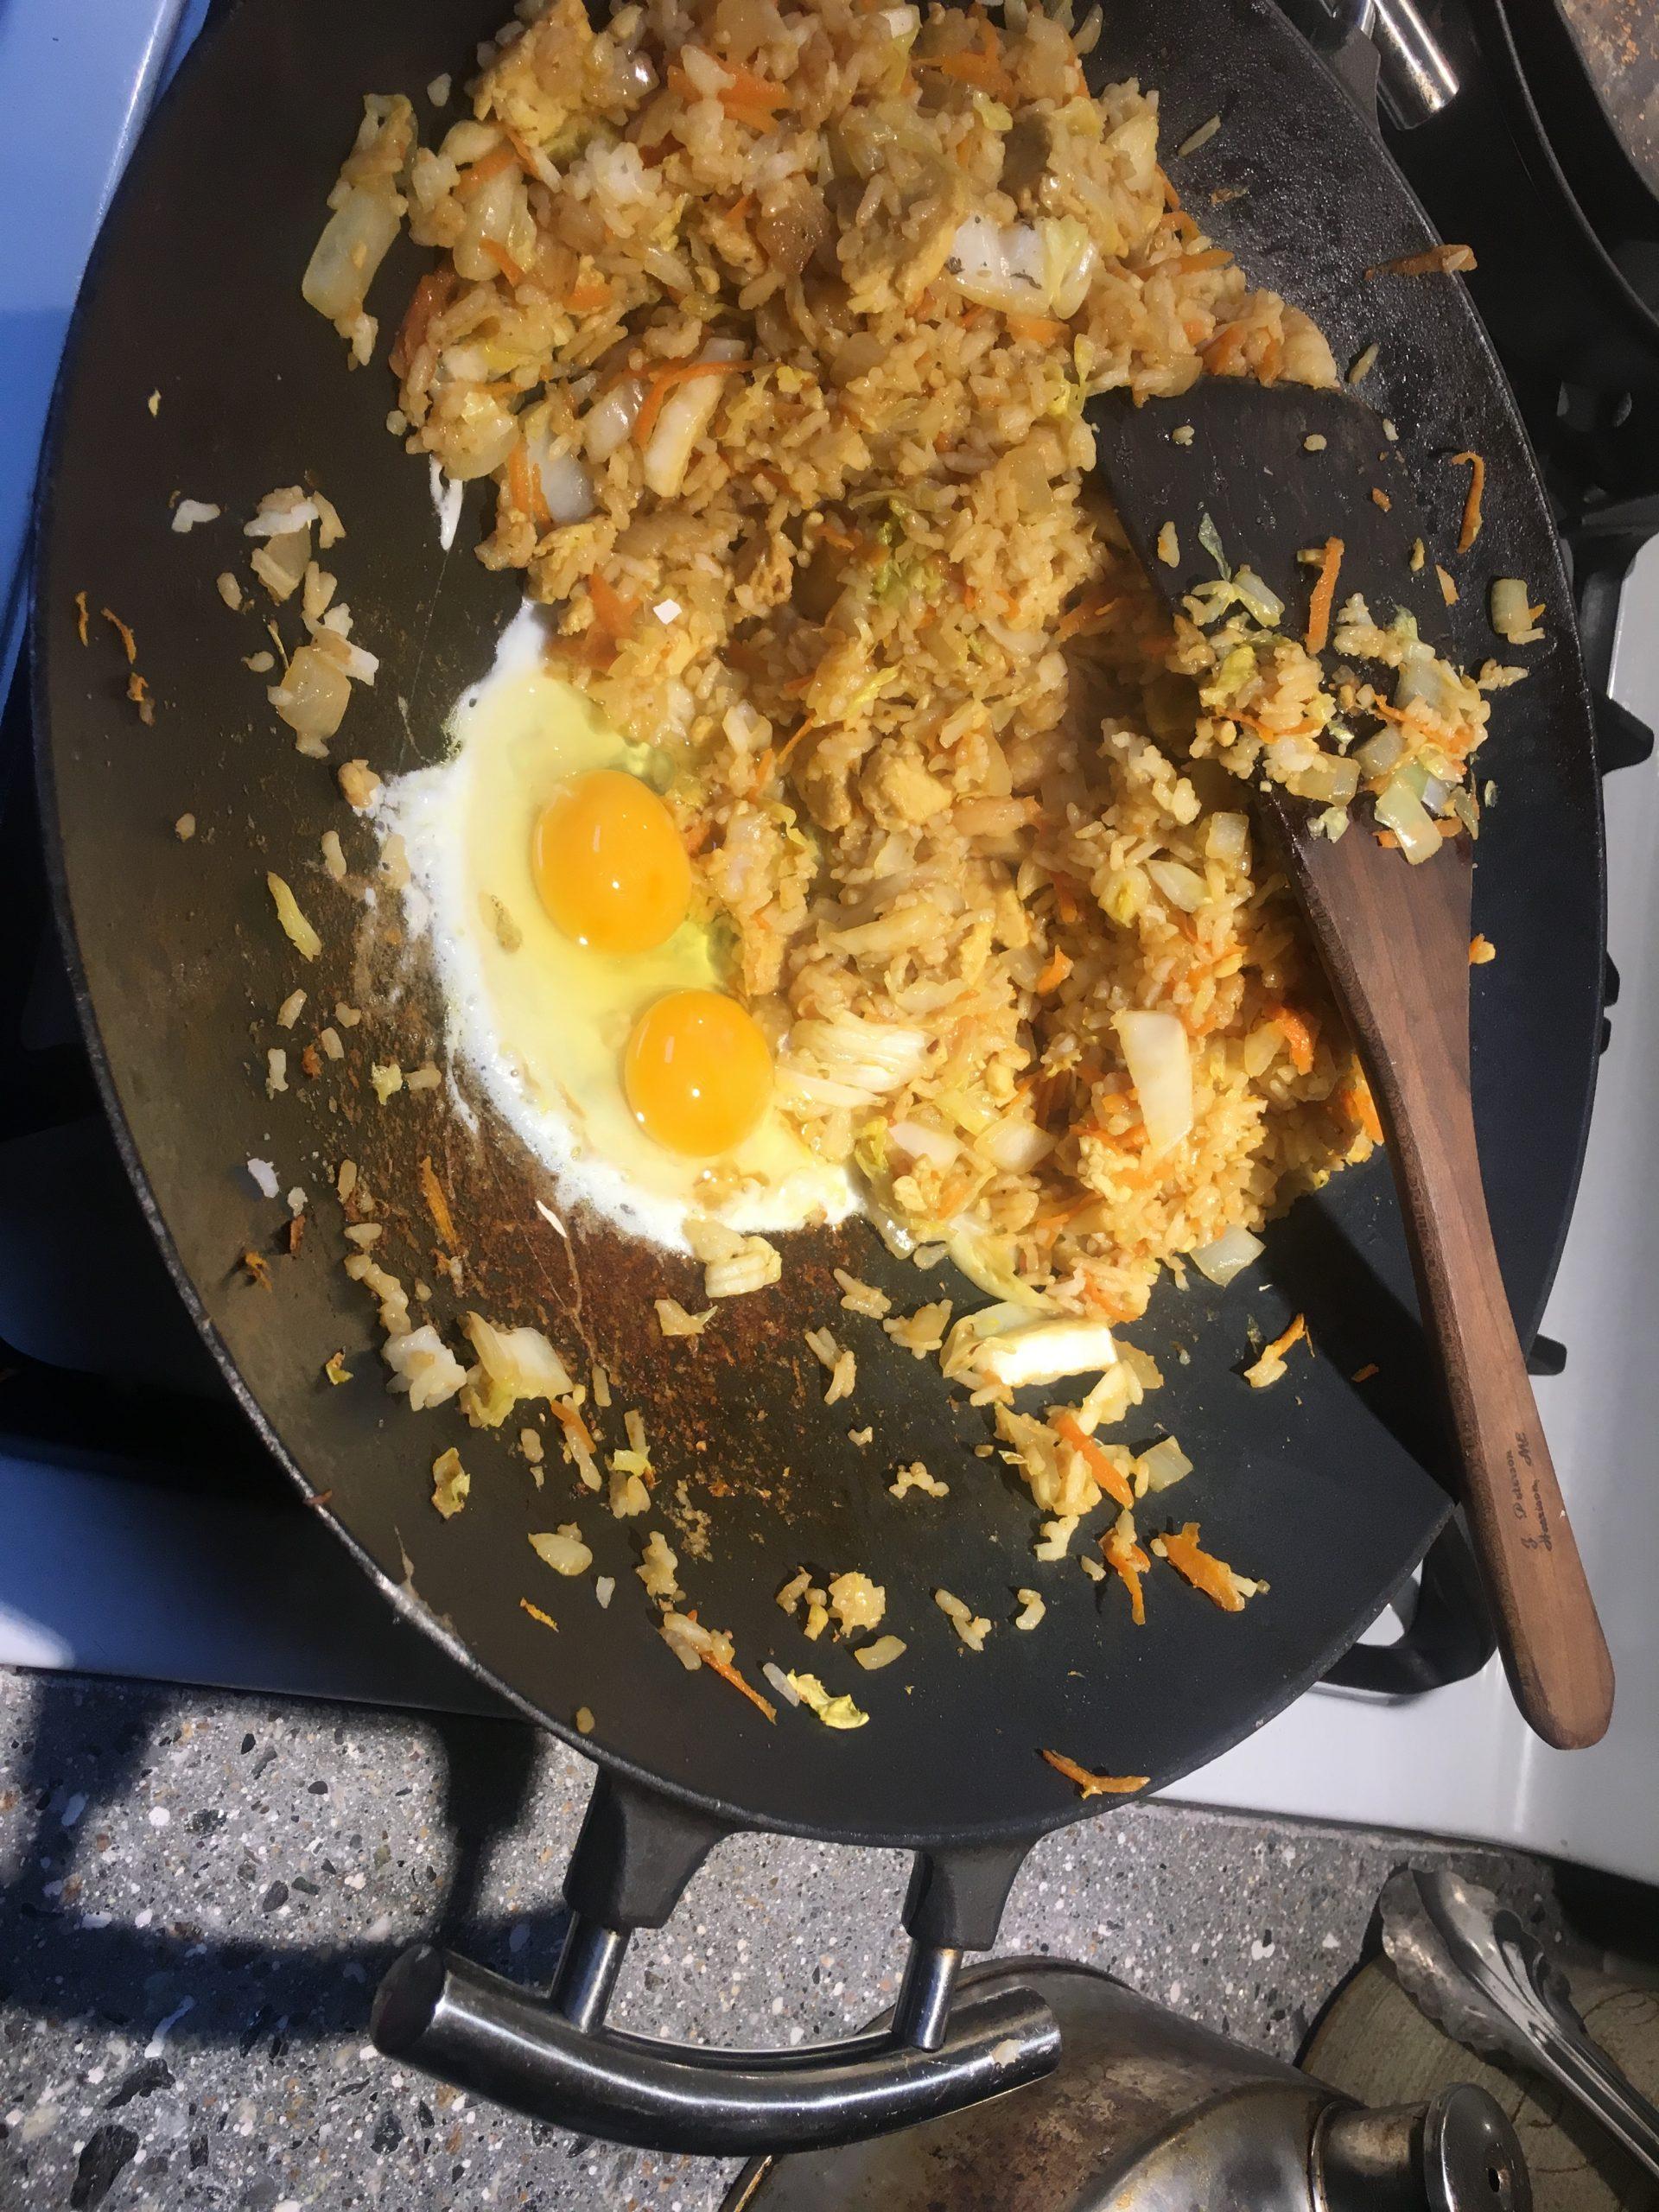 cast iron wok with fried rice